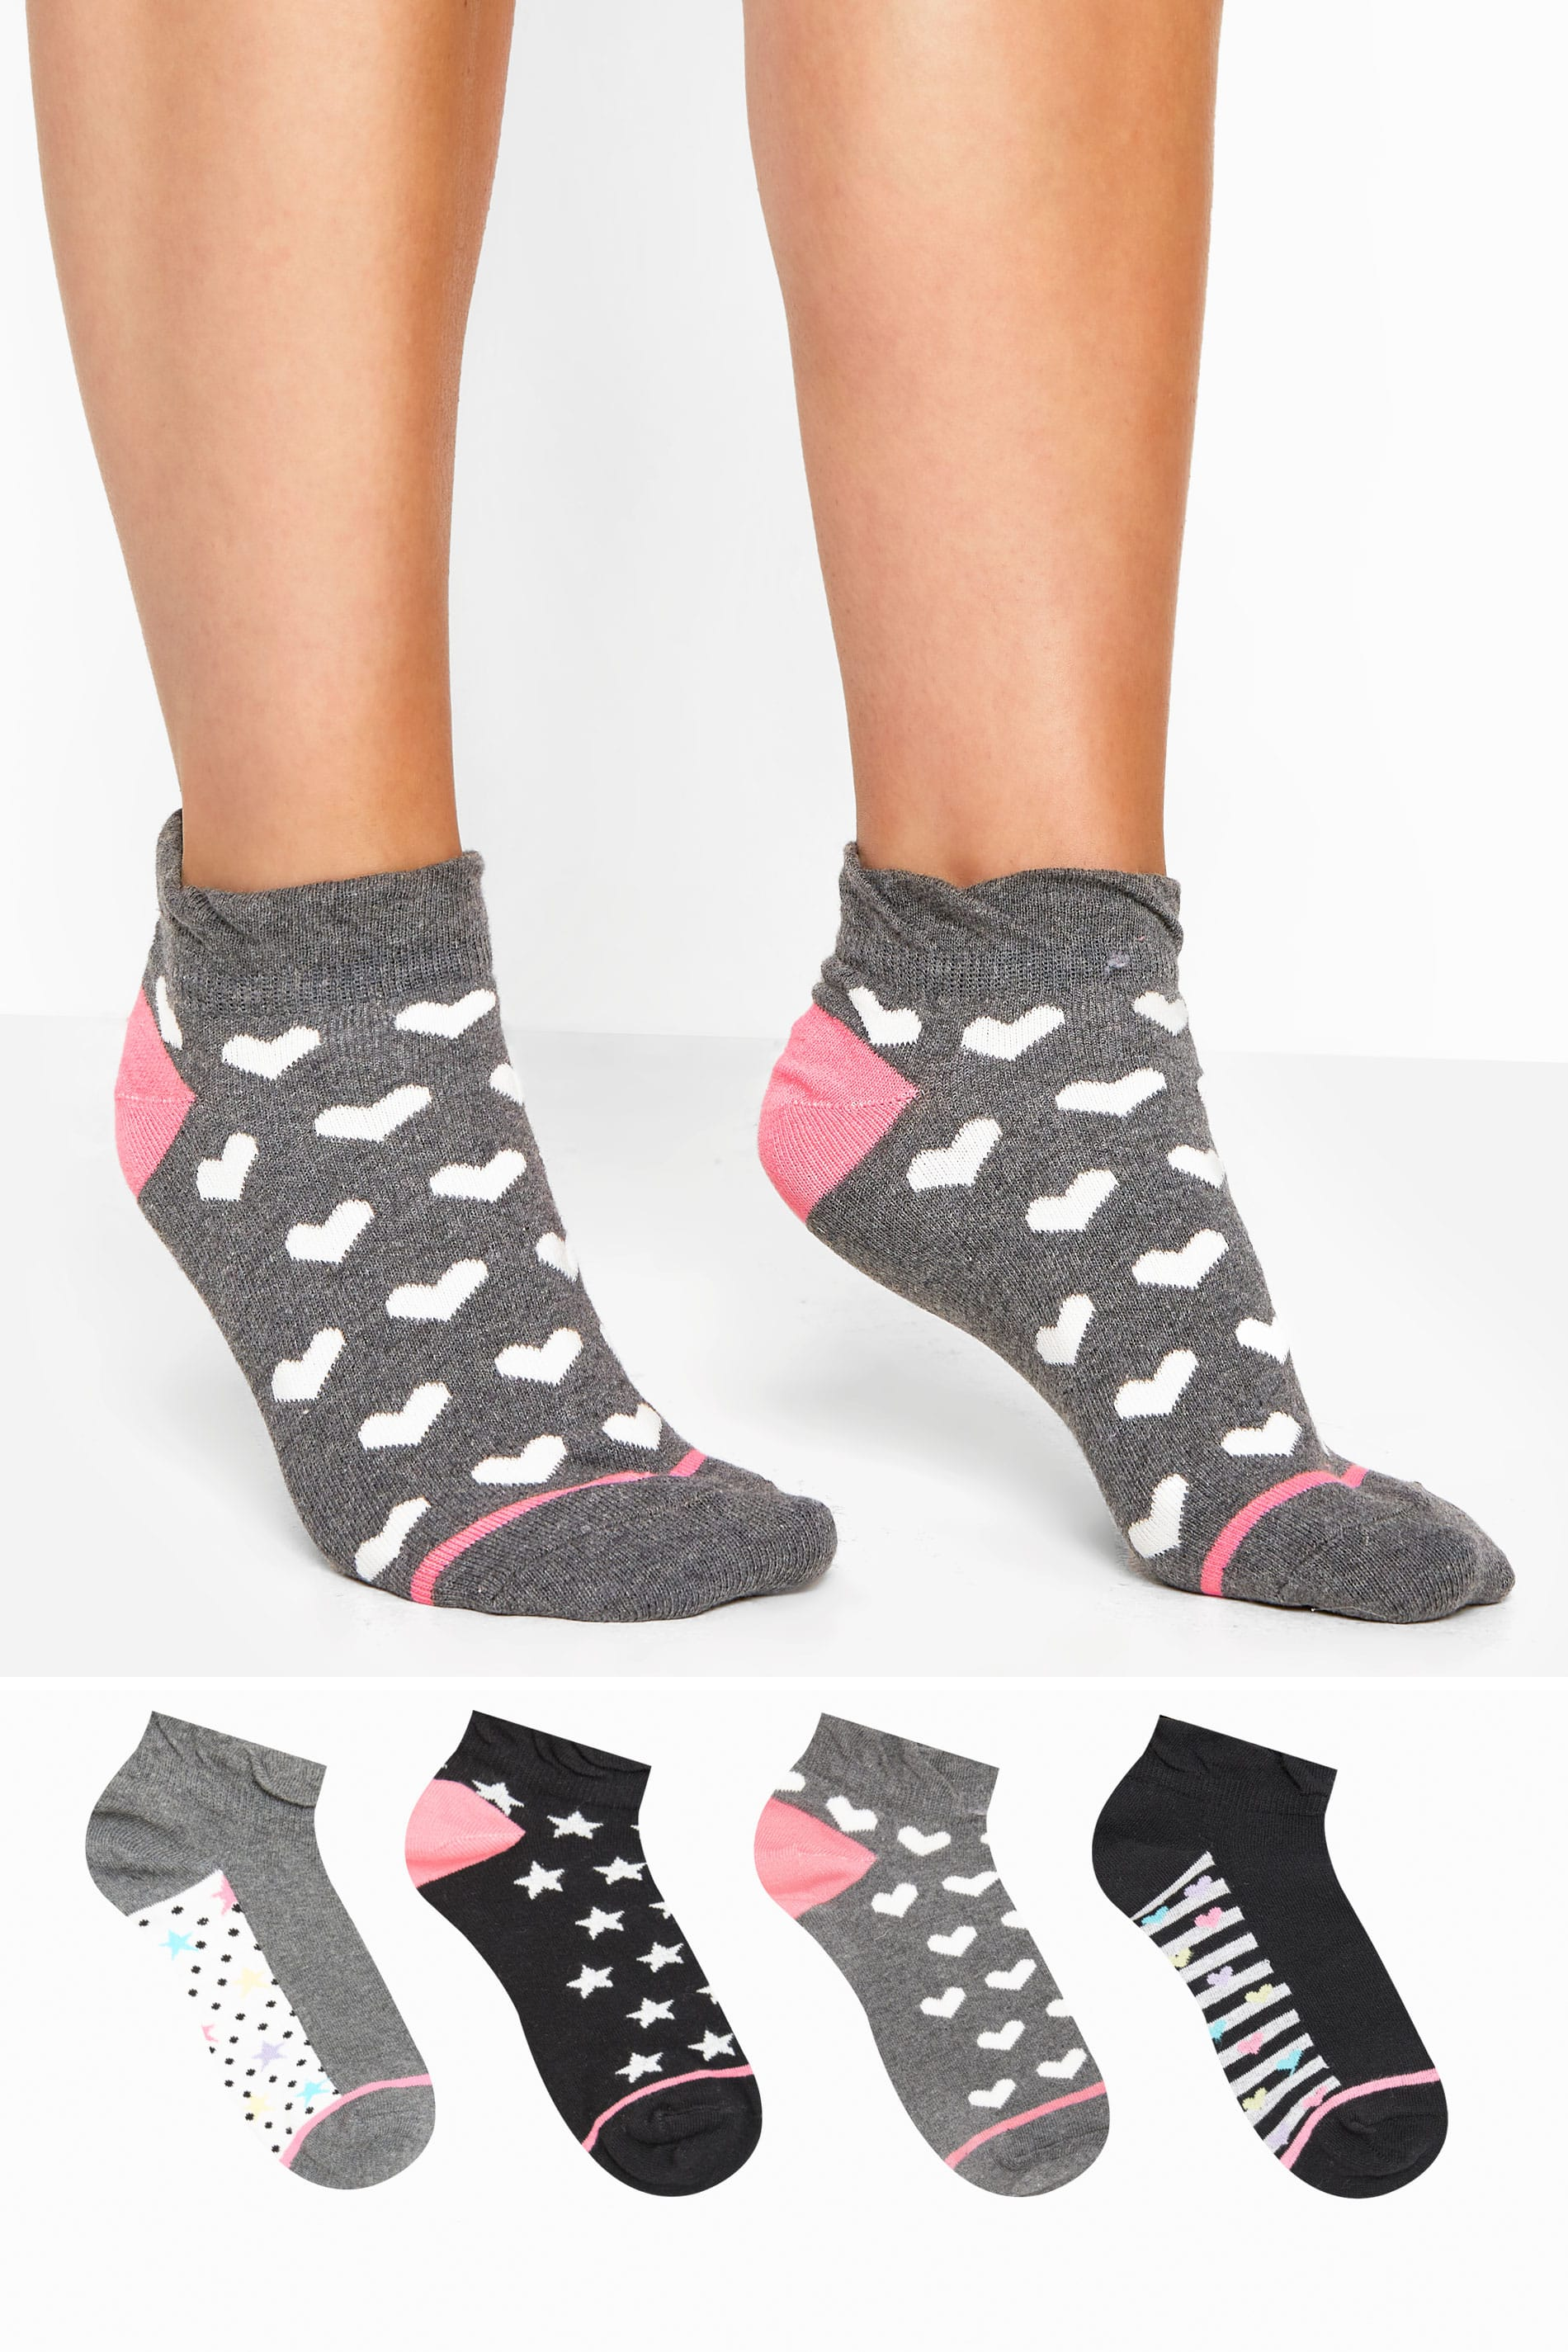 4 PACK Grey Hearts & Stars Trainer Socks